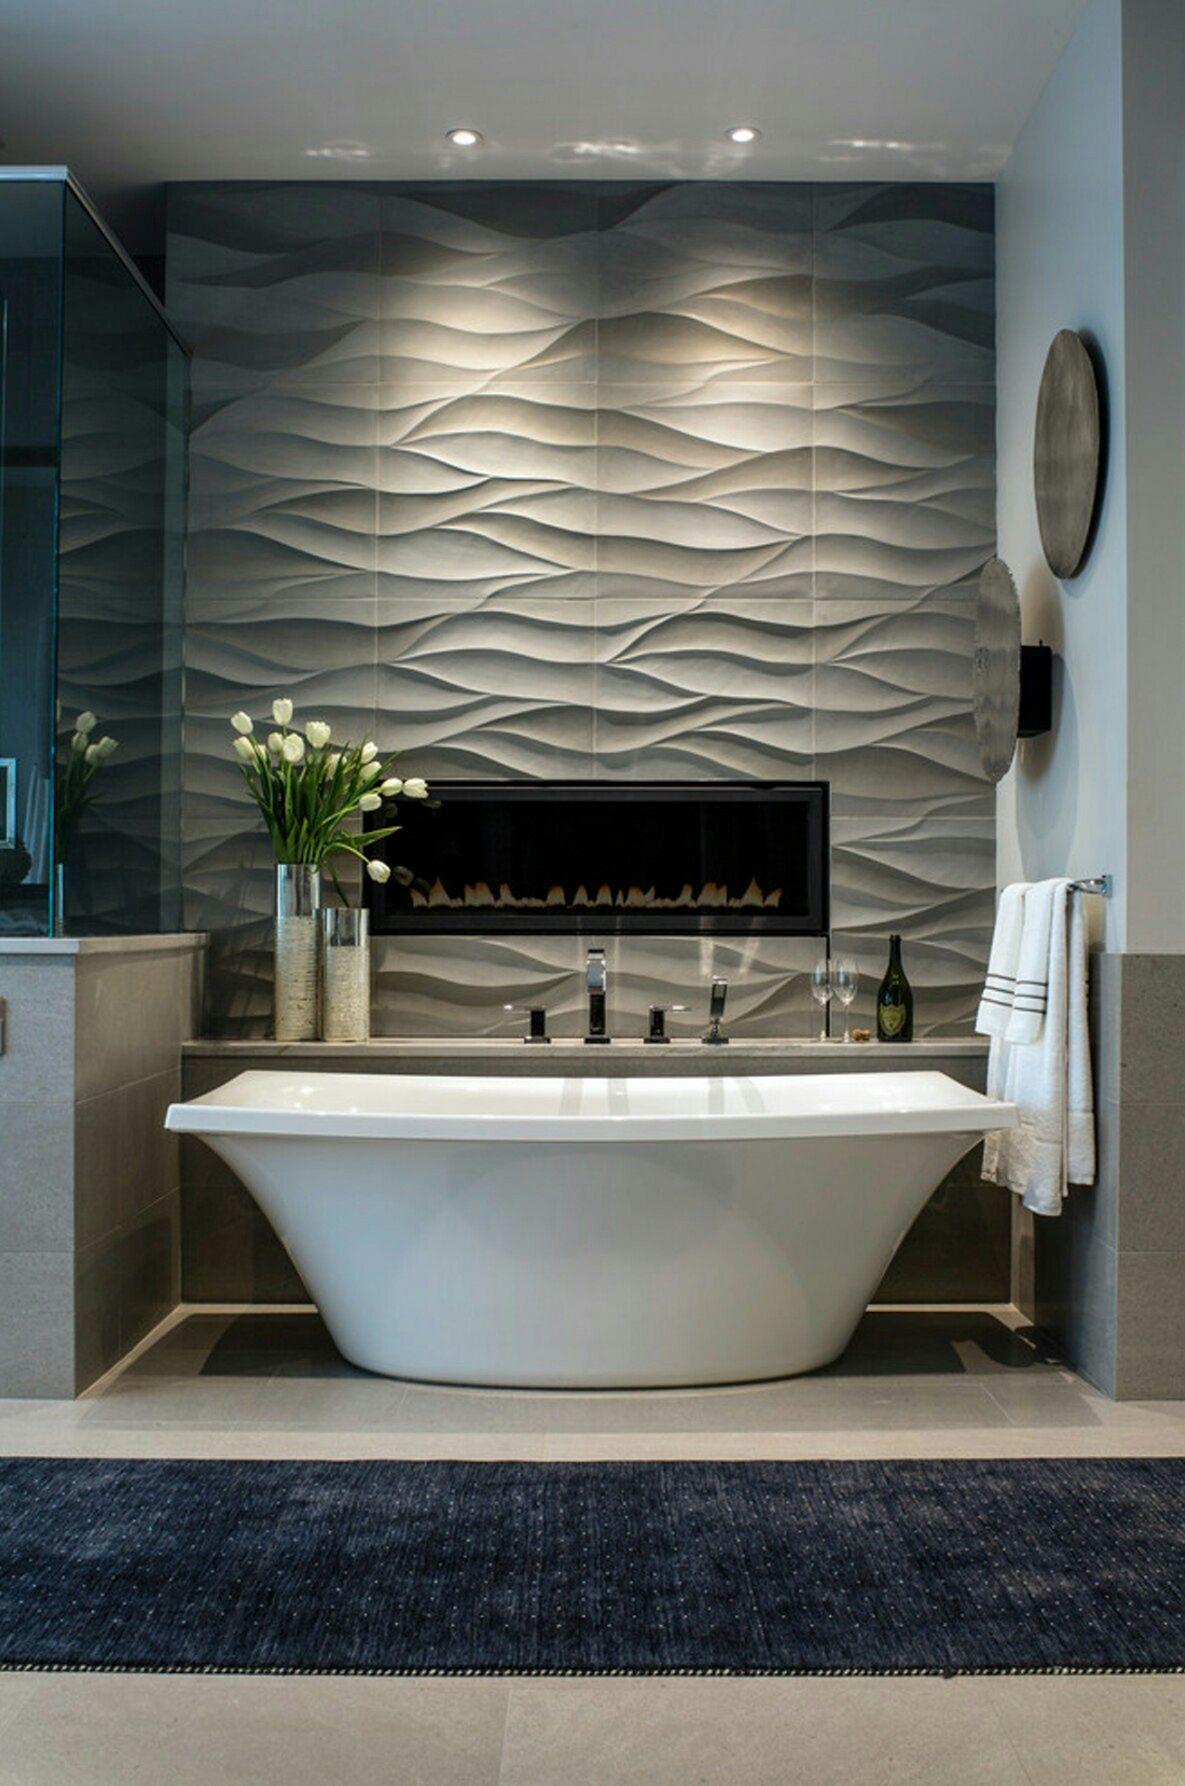 Nice Incredible Contemporary Fireplace Design Ideas 50 Best Pictures Https Decoor Net Incredi Bathroom Remodel Master Small Master Bathroom Bathroom Design